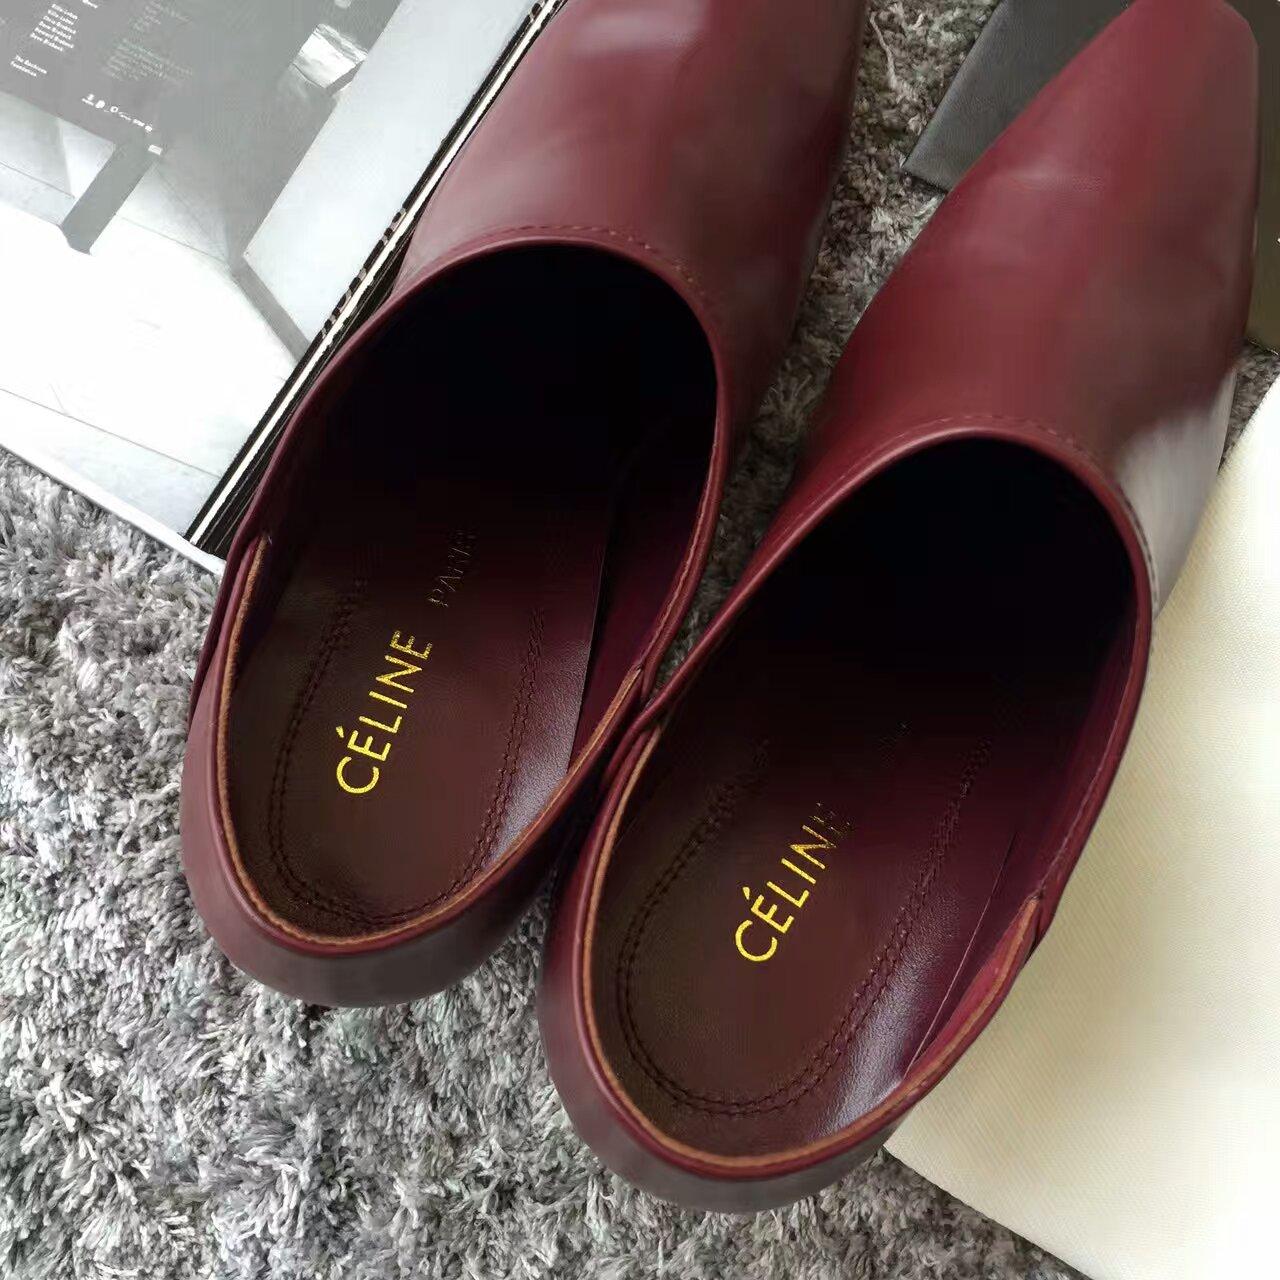 016/CELINE新款踩跟高跟鞋‼️顶级版本原版